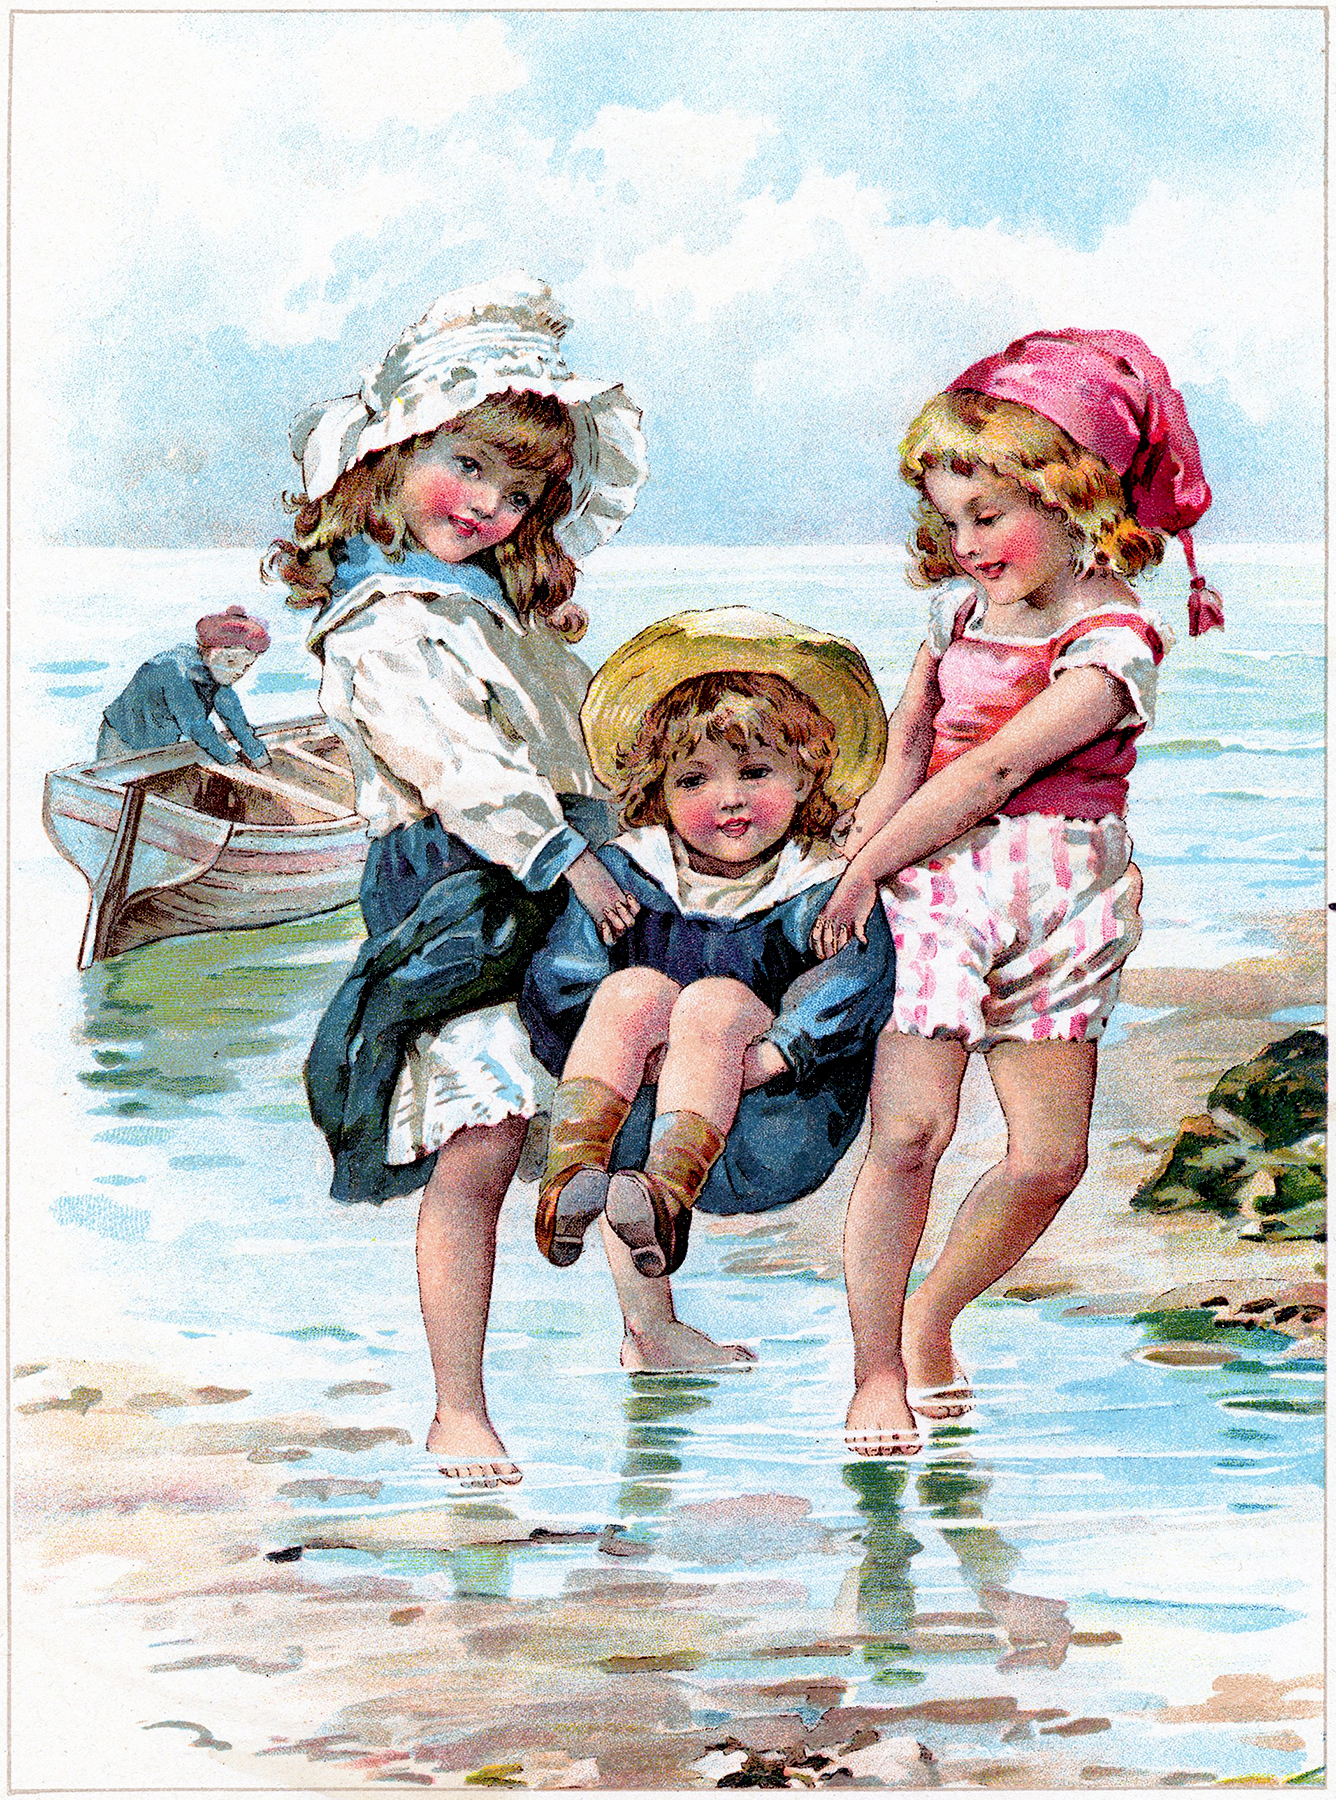 Children Playing in Ocean Image